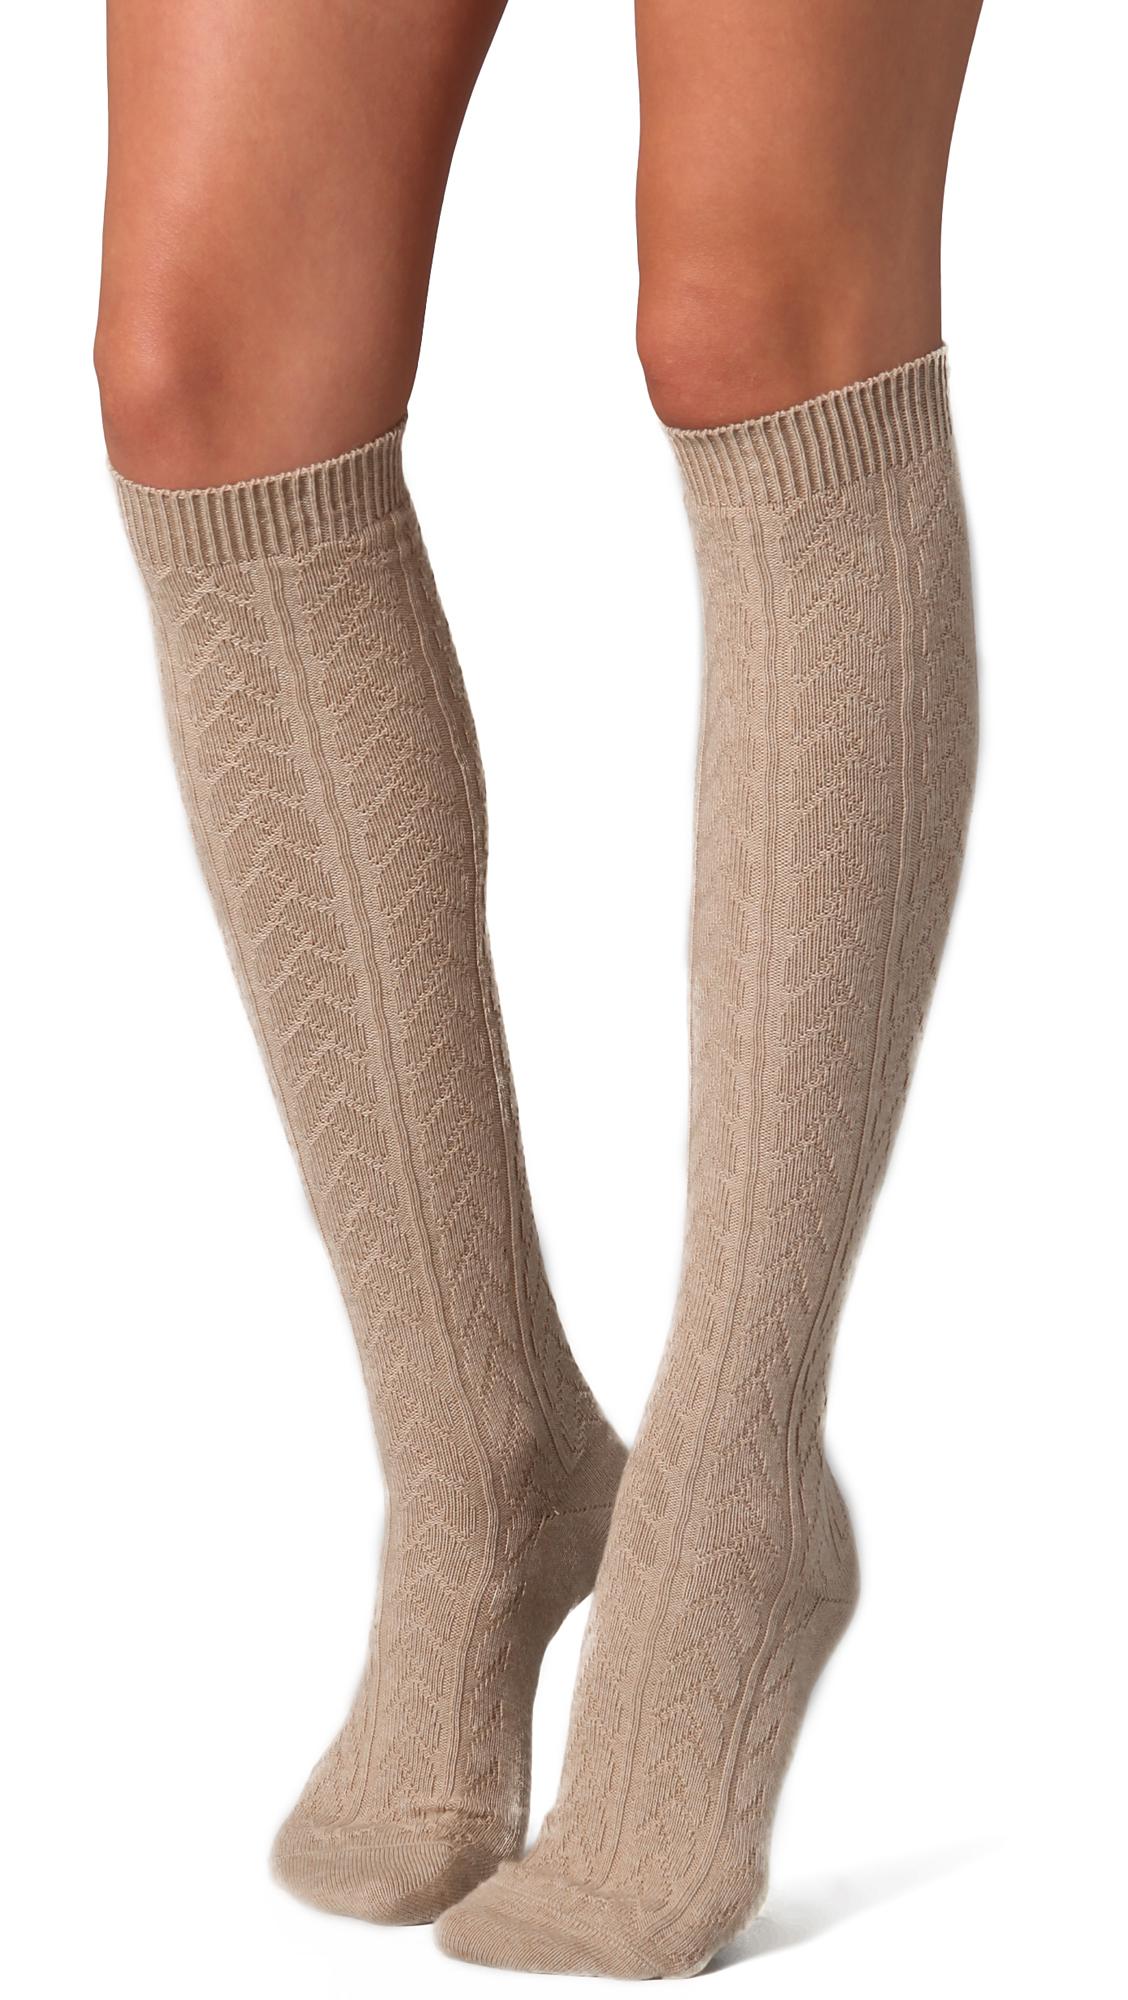 c031f84bdf2 Falke Striggings Cable Knit Knee High Socks